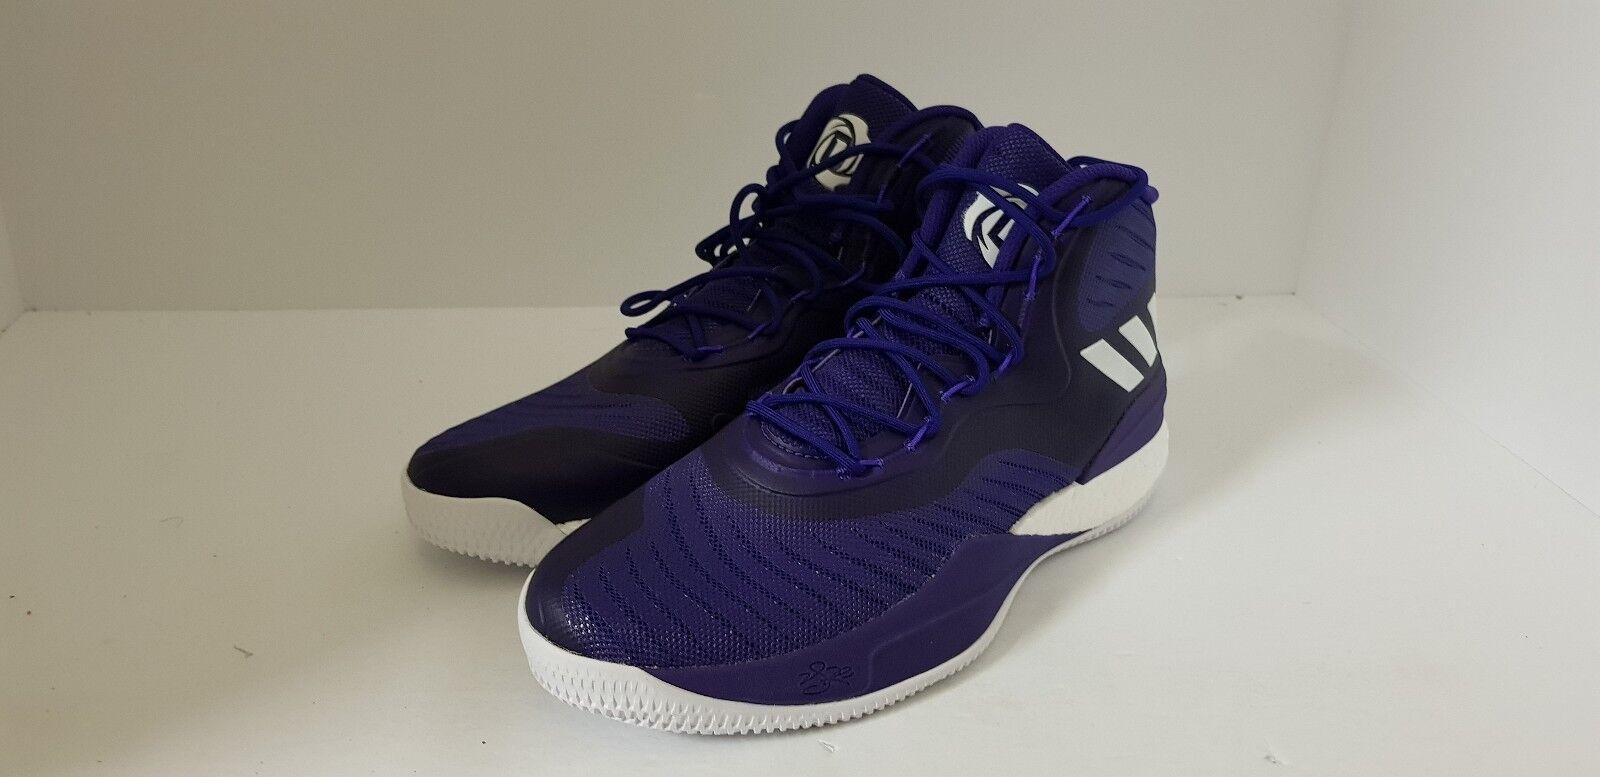 adidas D Rose 8 VIII Derrick Rose Men Basketball Shoes Sneakers Trainers Pick 1